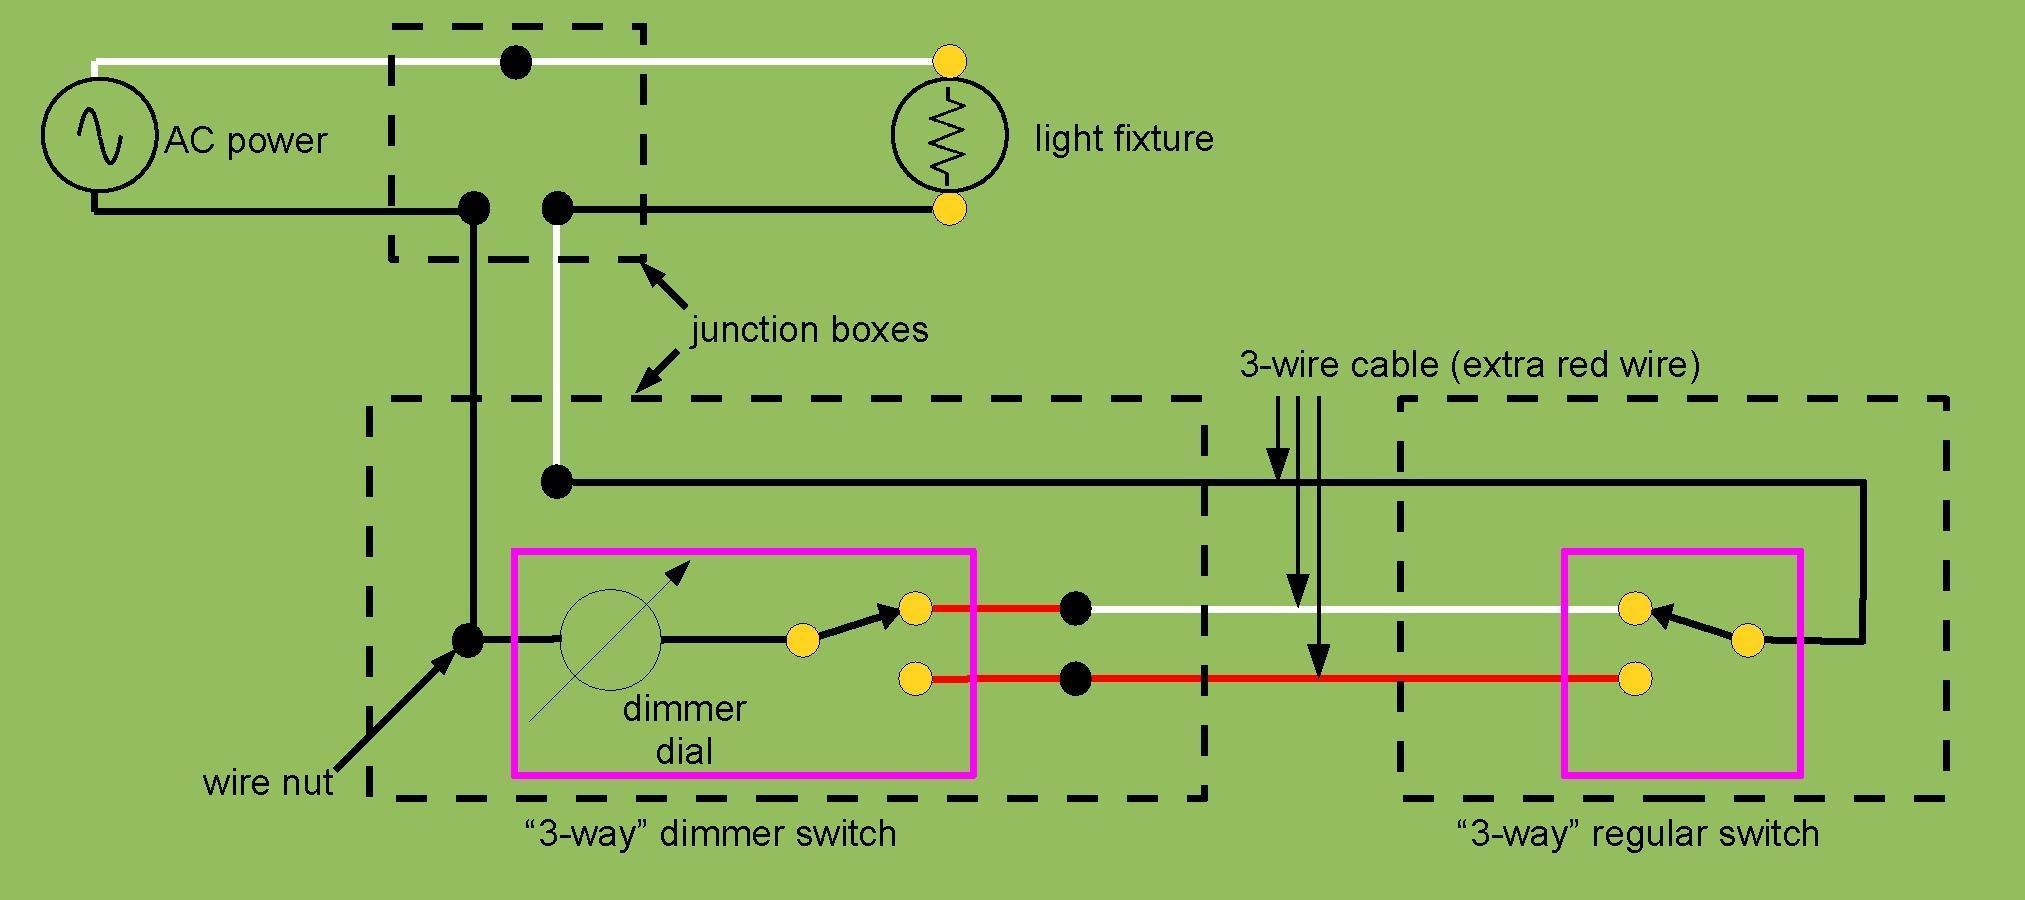 File:3-Way Dimmer Switch Wiring.pdf - Wikimedia Commons - 3 Way Dimmer Switches Wiring Diagram